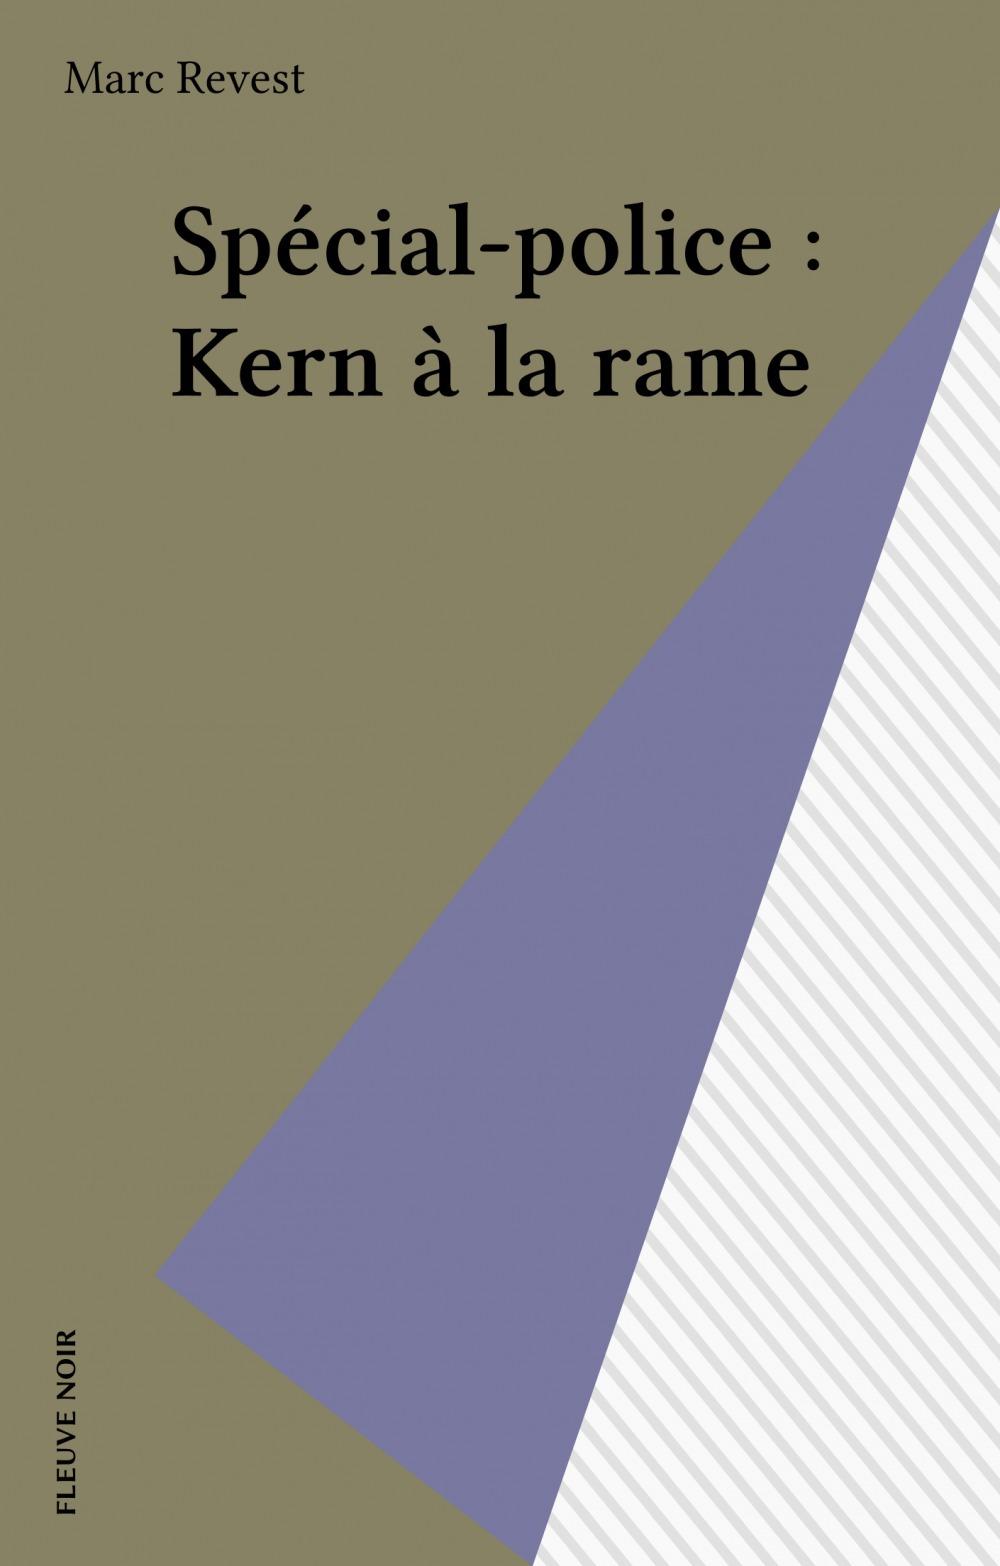 Spécial-police : Kern à la rame  - Revest  - Marc Revest